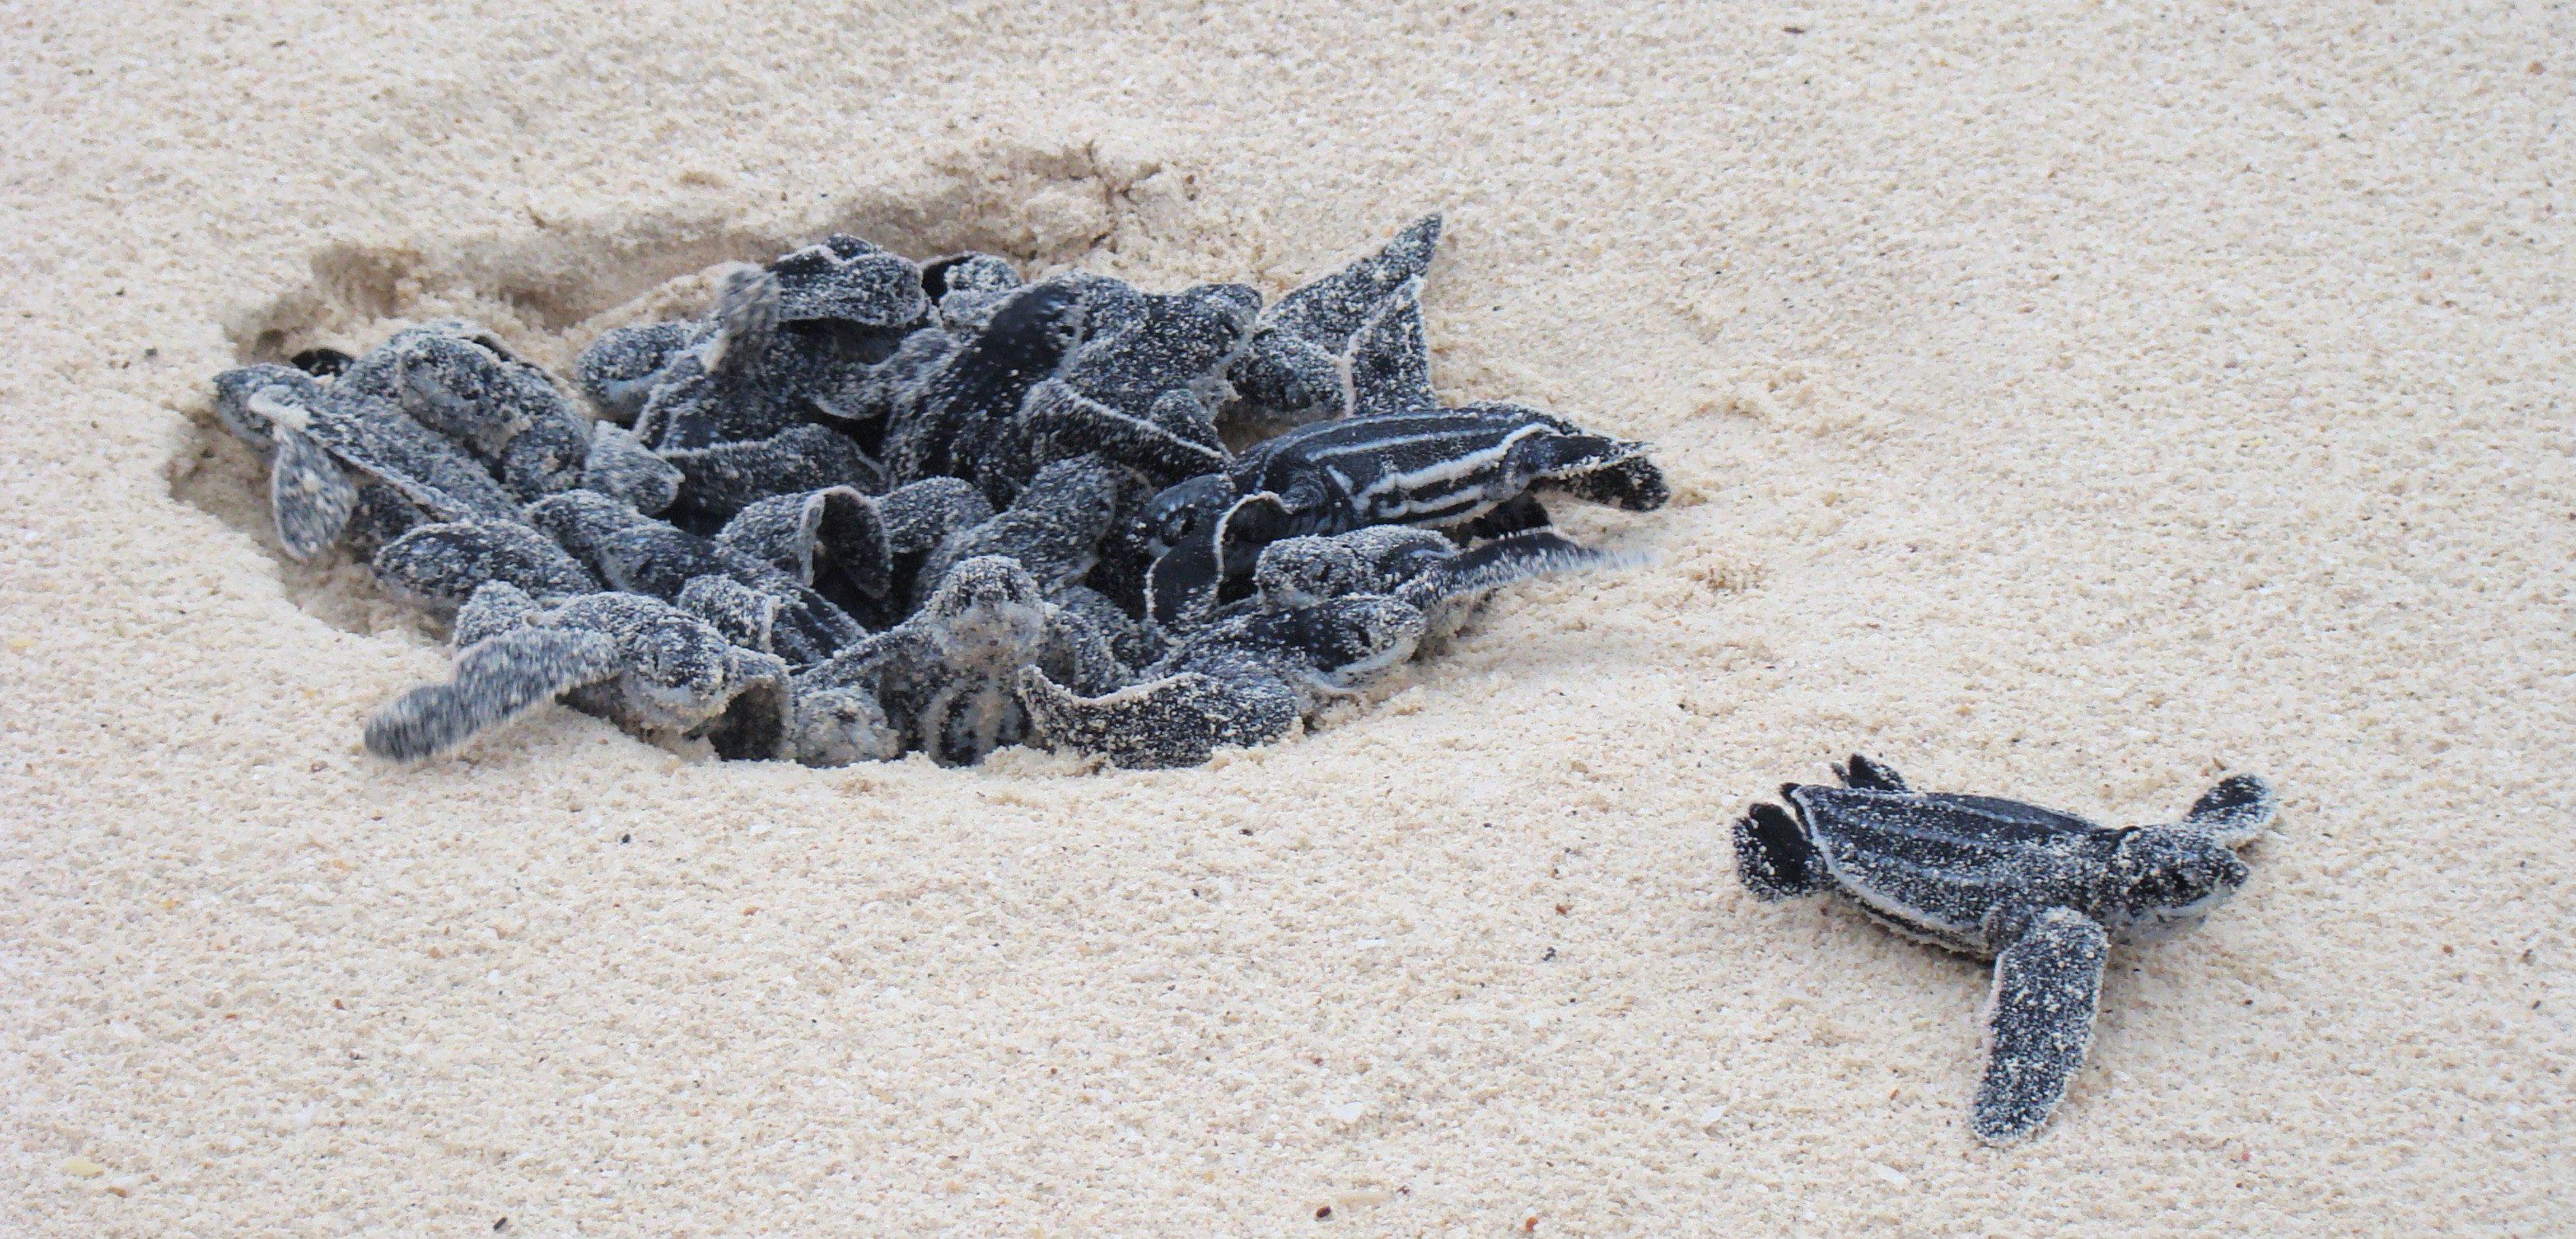 Florida updates sea turtle nesting totals for 2018